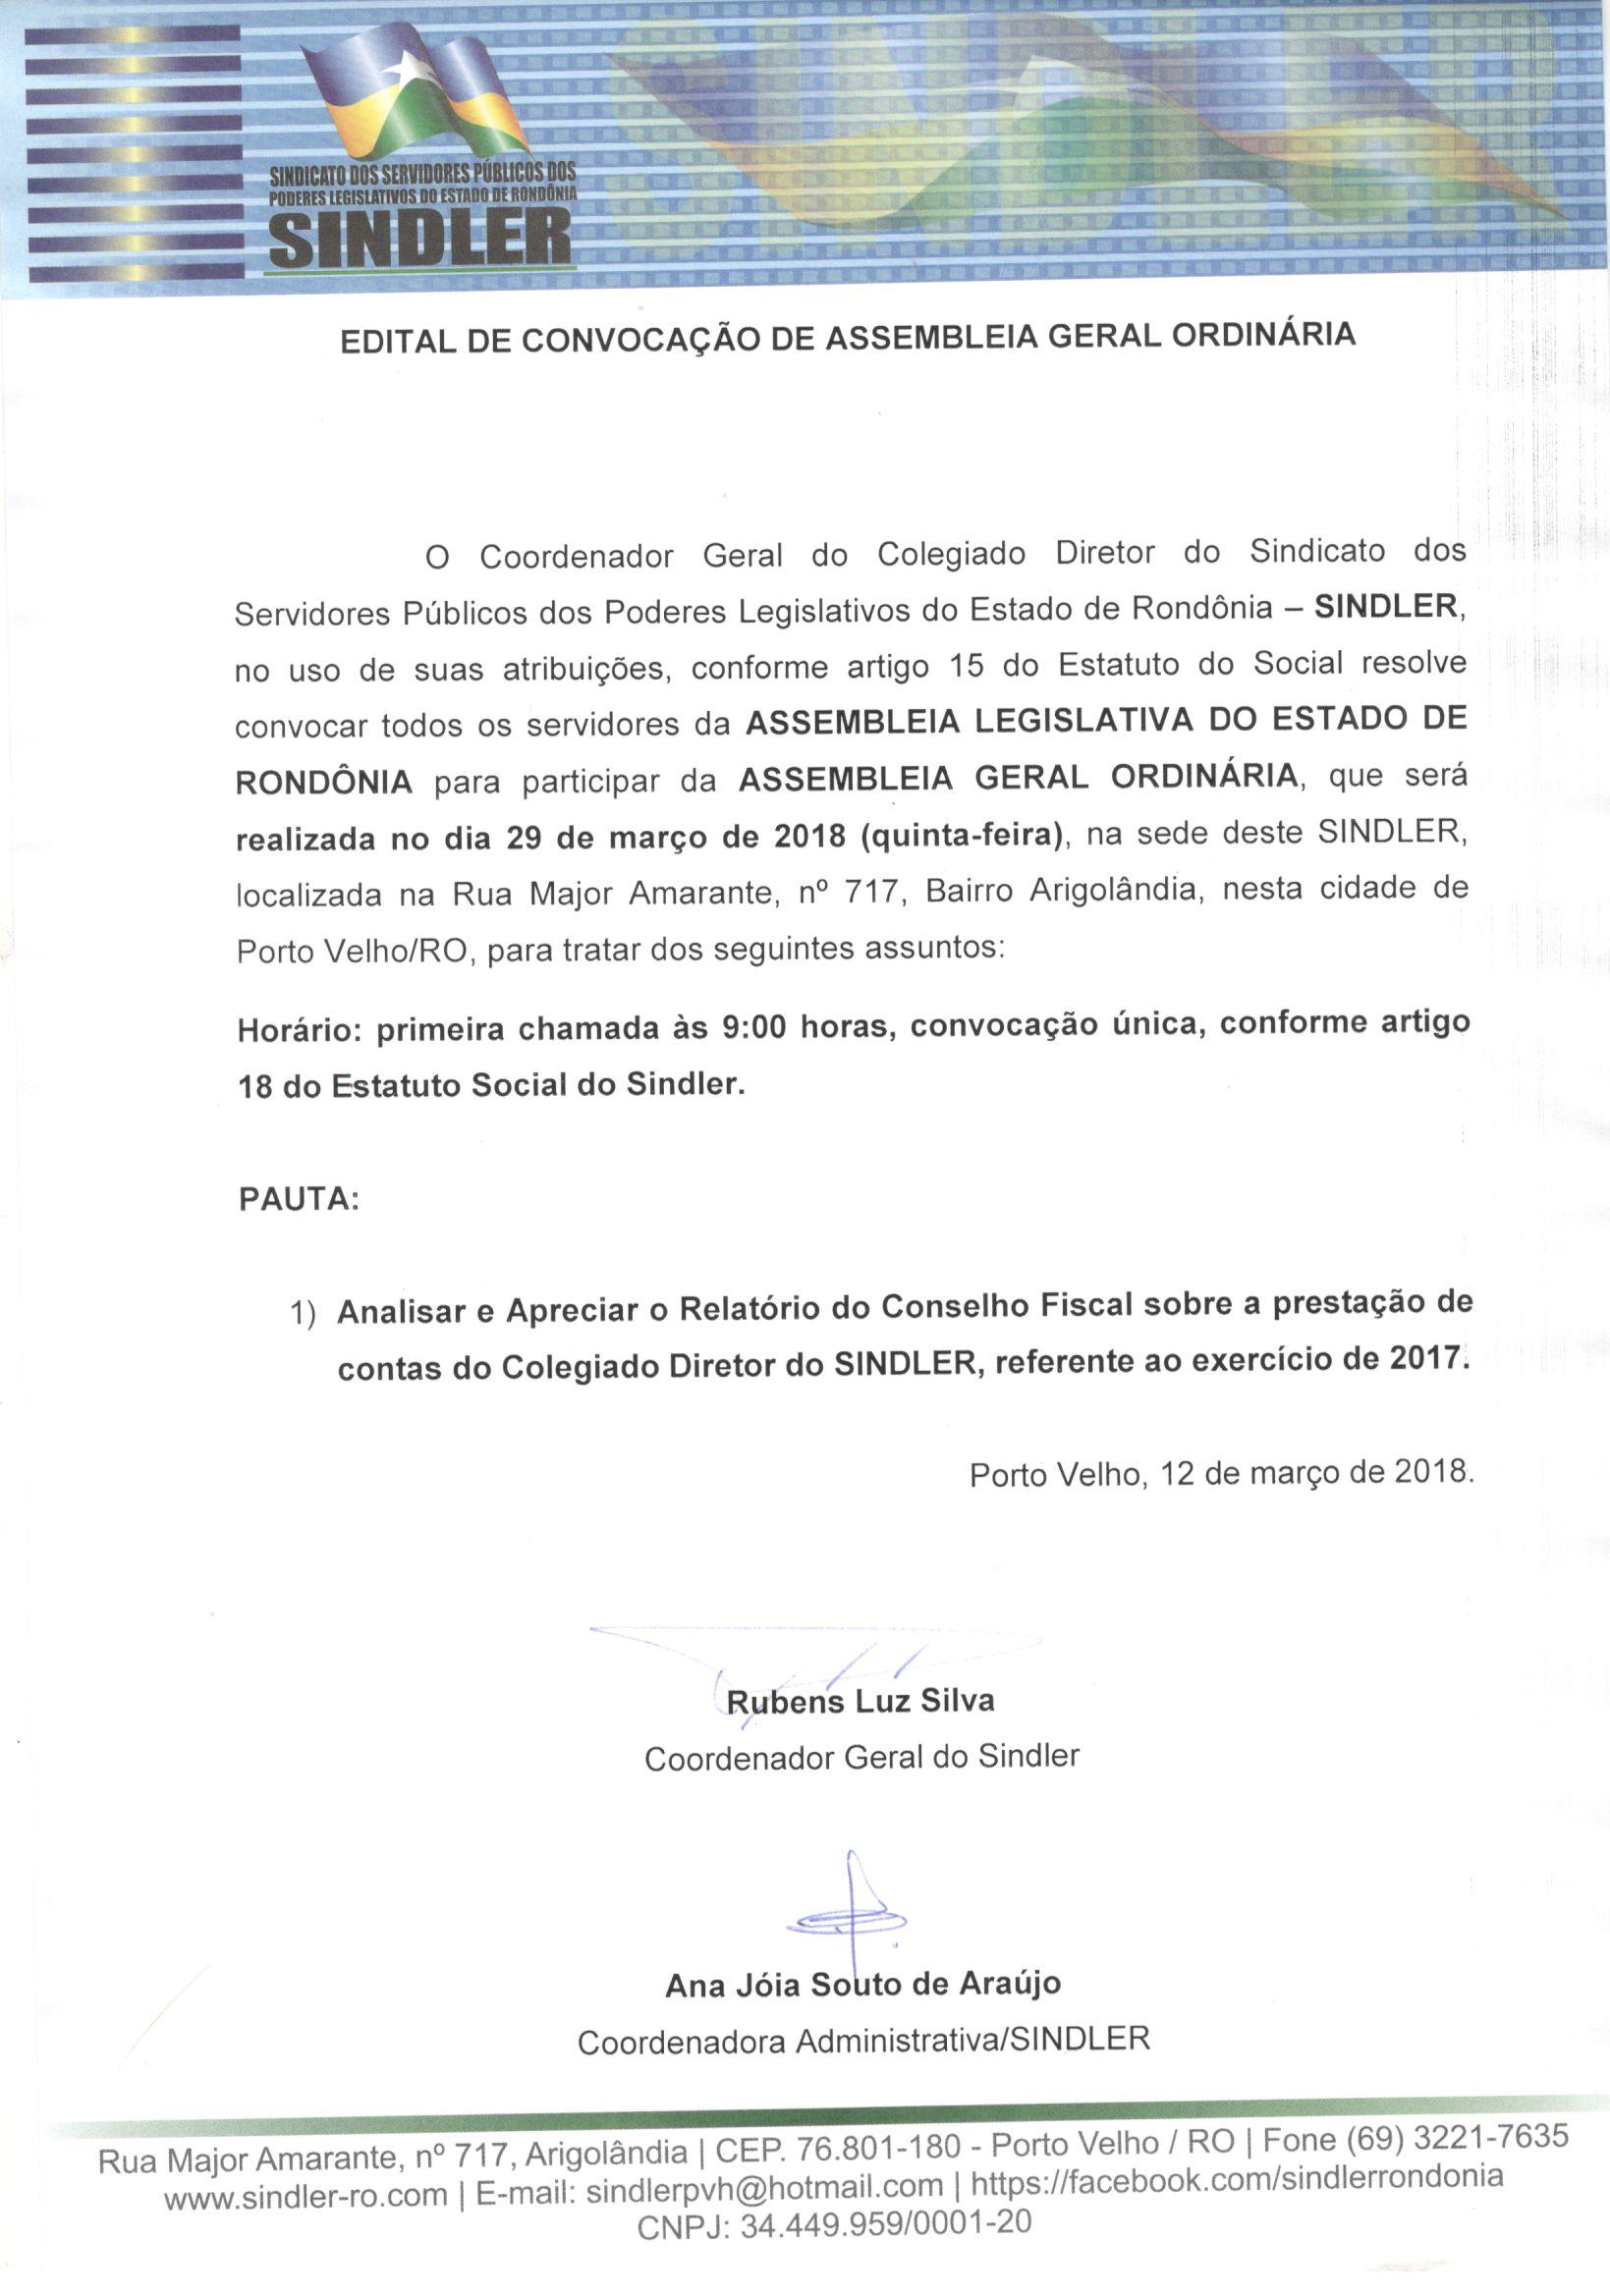 EDITAL CONVOCACAO AGO 29 MARCO2018